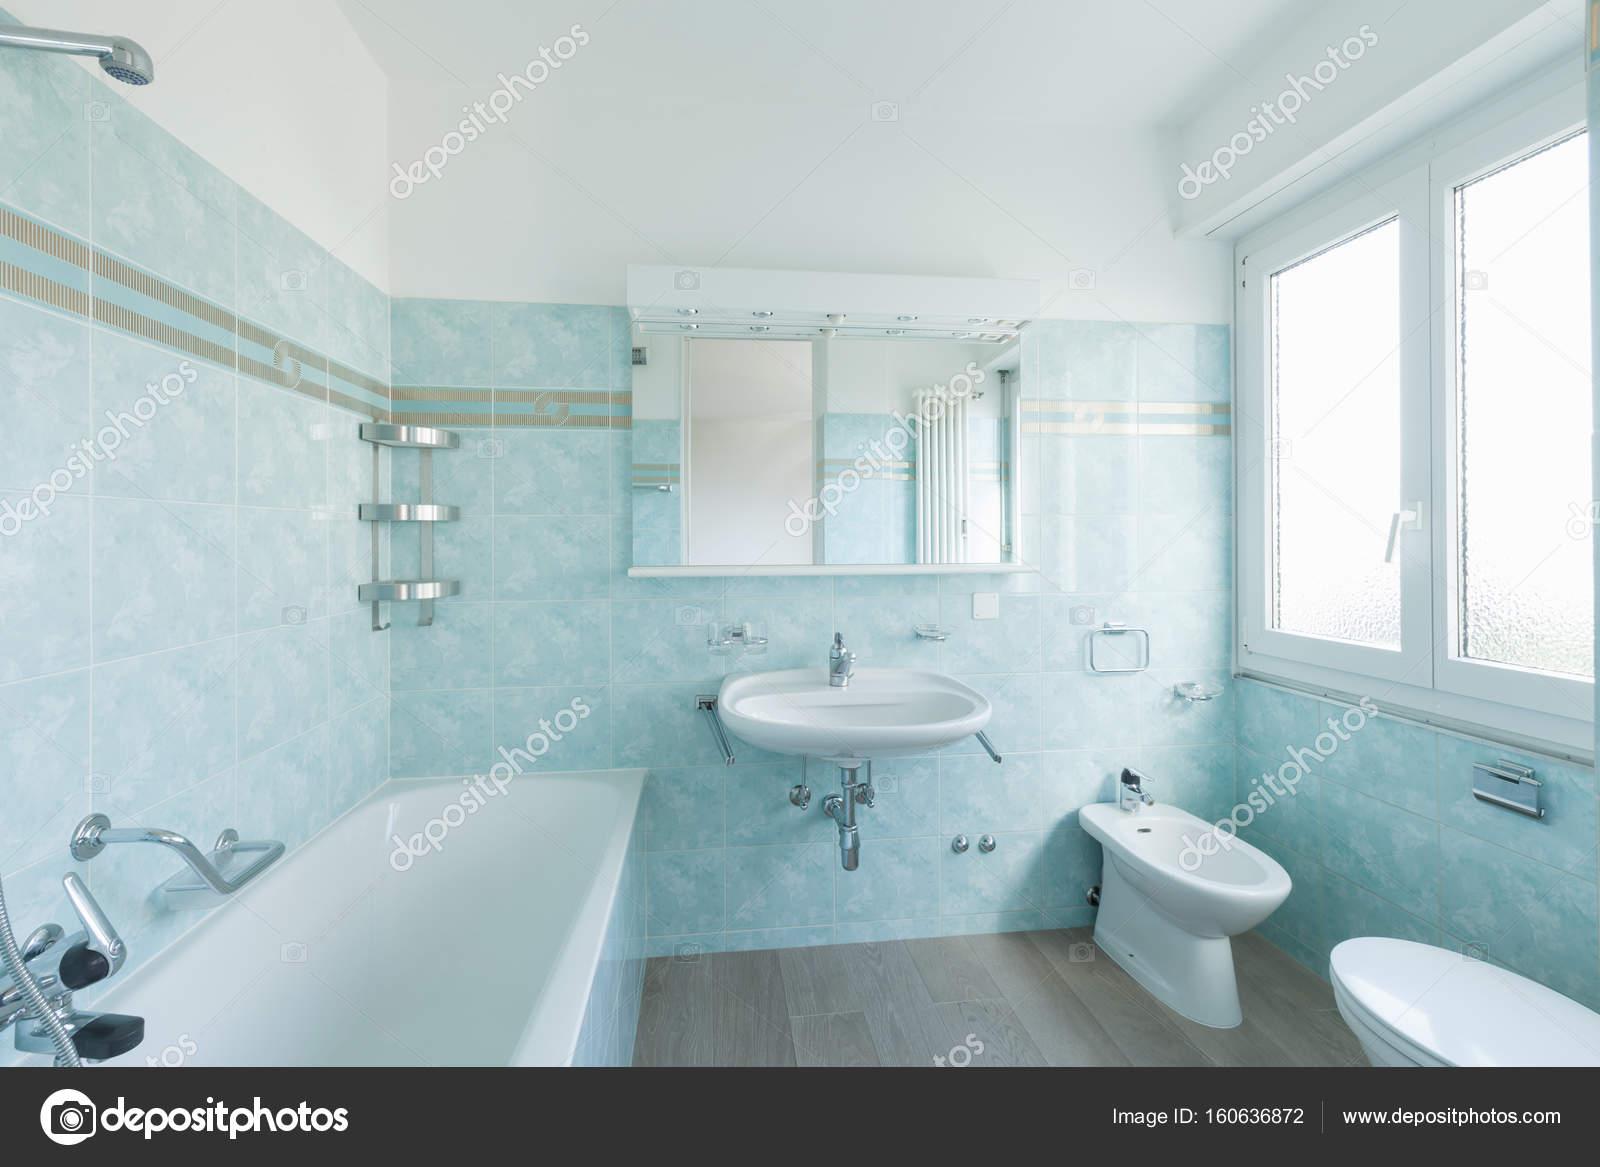 Salle de bain Vintage bleu — Photographie Zveiger © #160636872